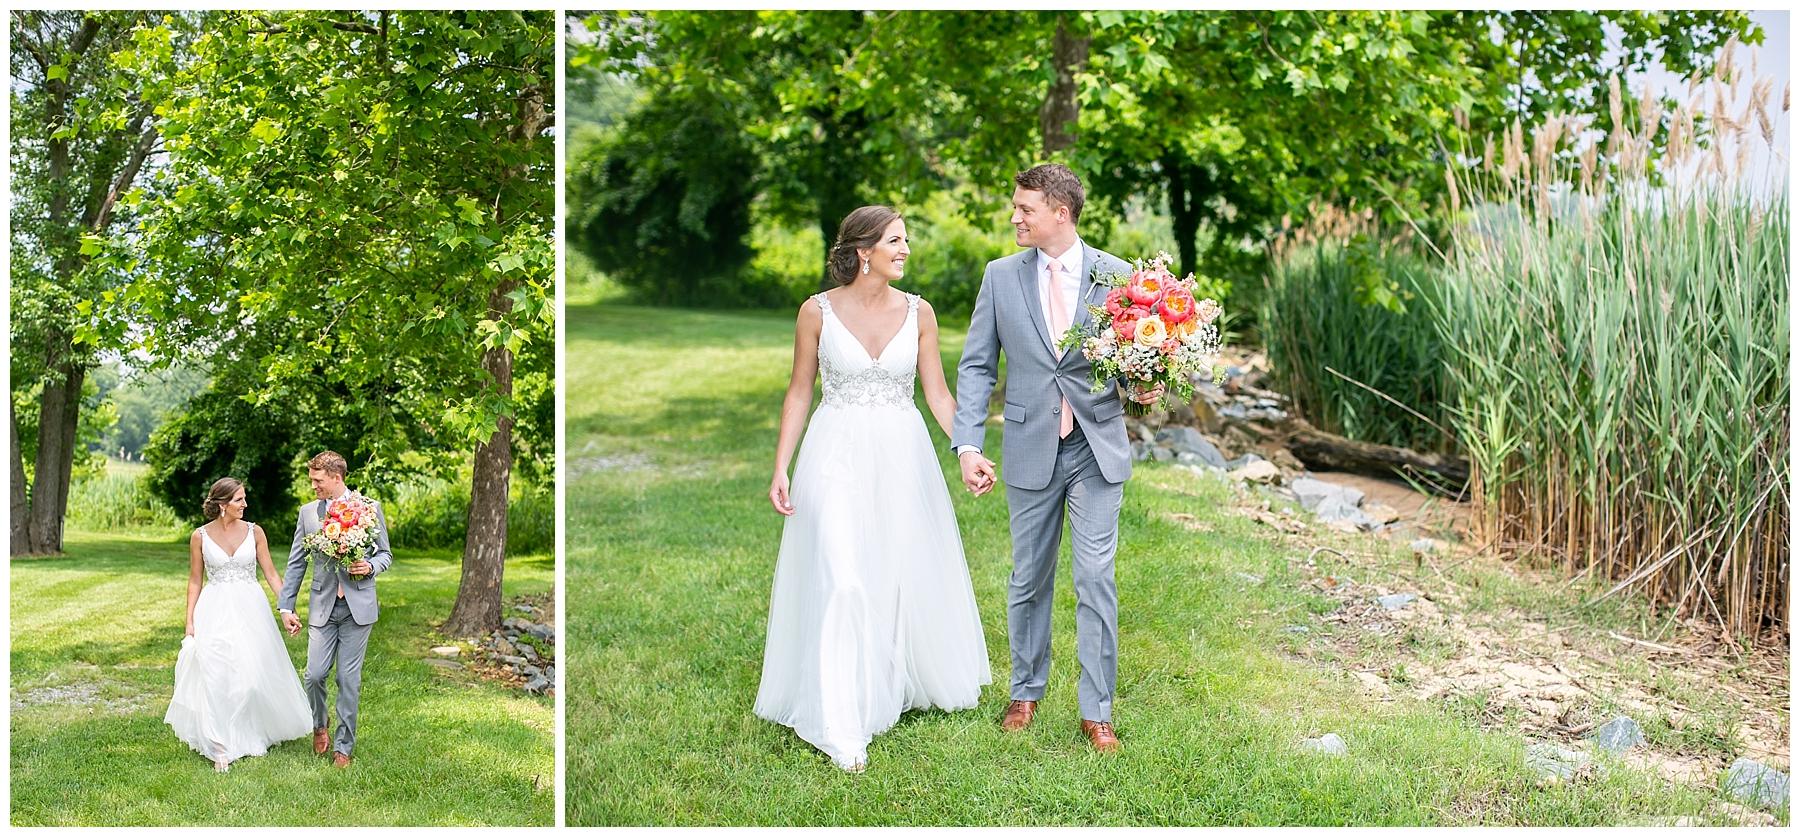 Chelsea Phil Bohemia River Overlook Wedding Living Radiant Photography photos_0039.jpg